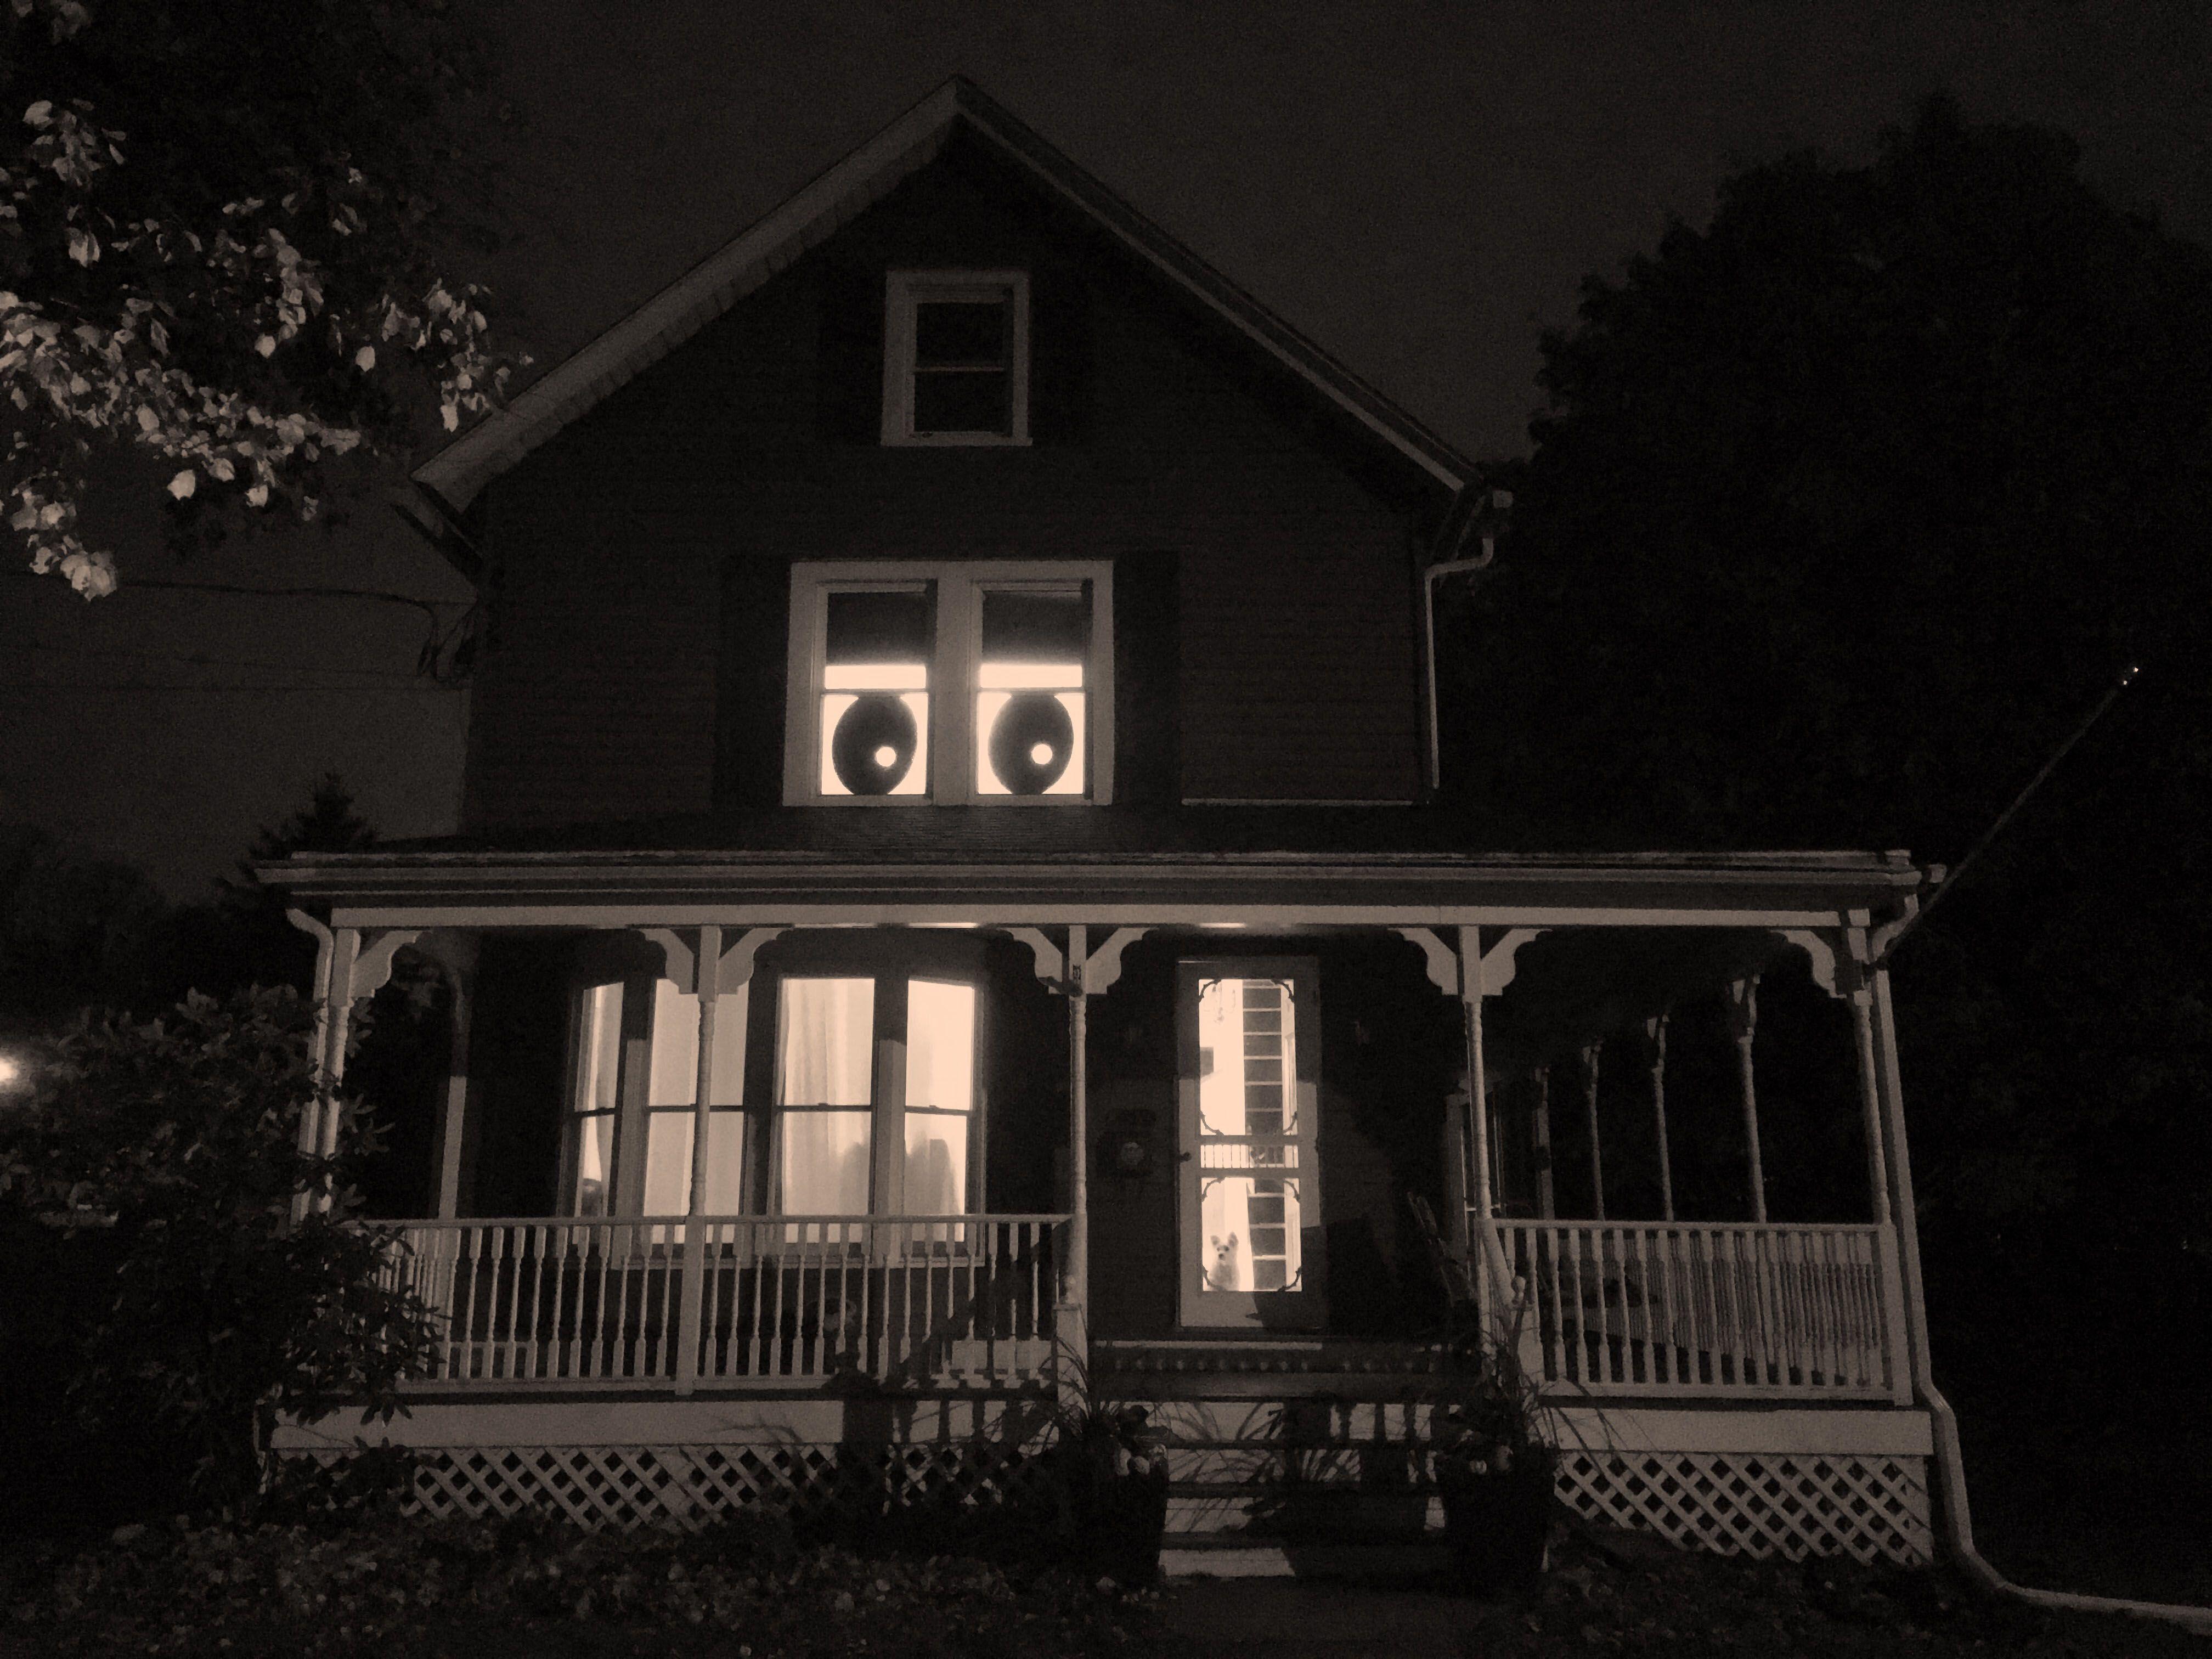 Mischief Night Surveillance Surveillance Night Lamp Post